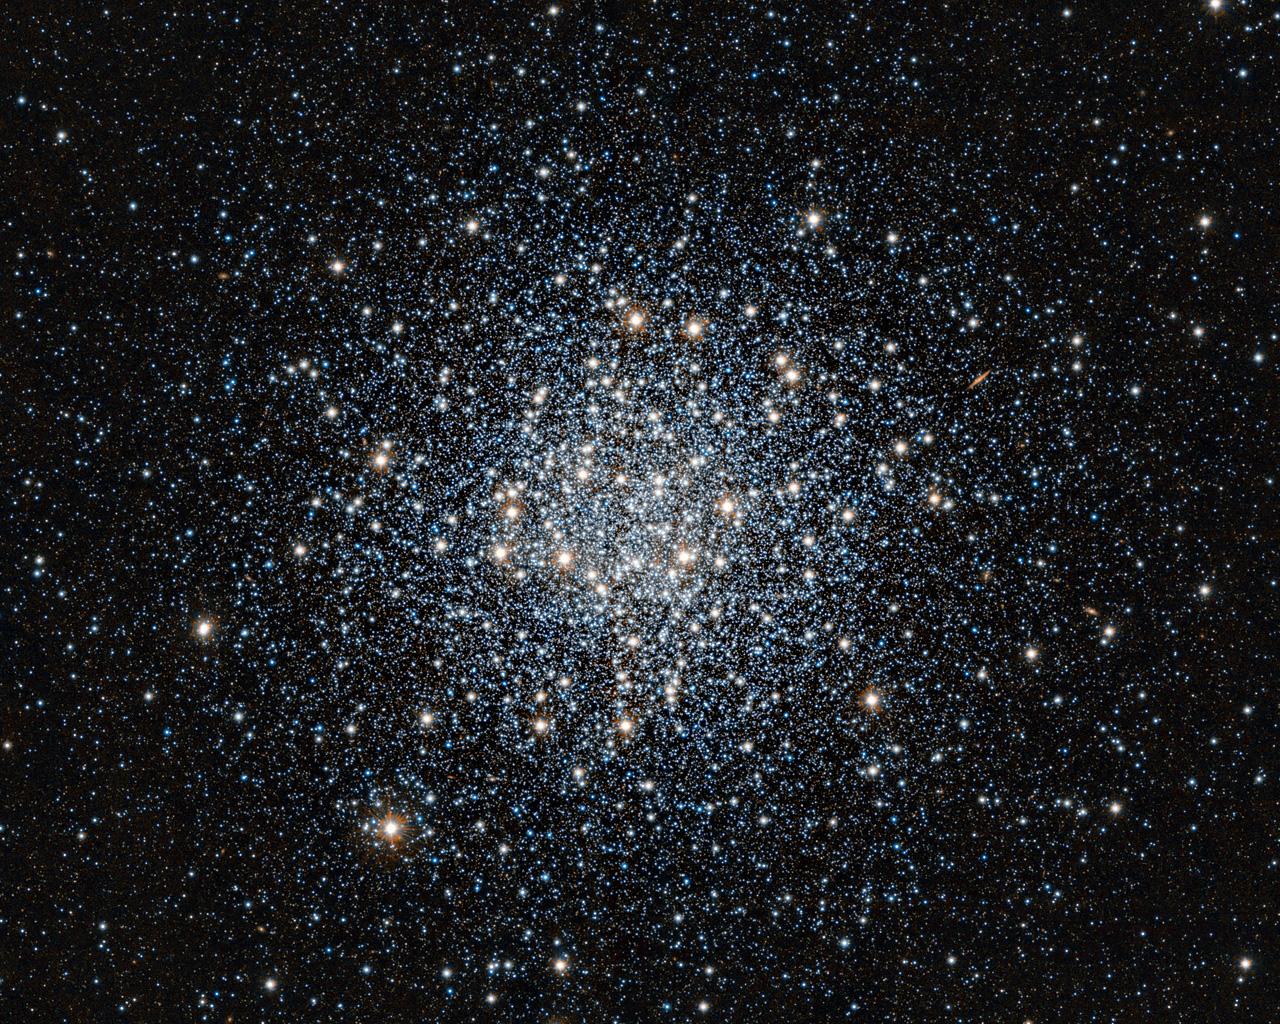 Imagen infrarroja del cúmulo globular de estrellas Messier 55 ...